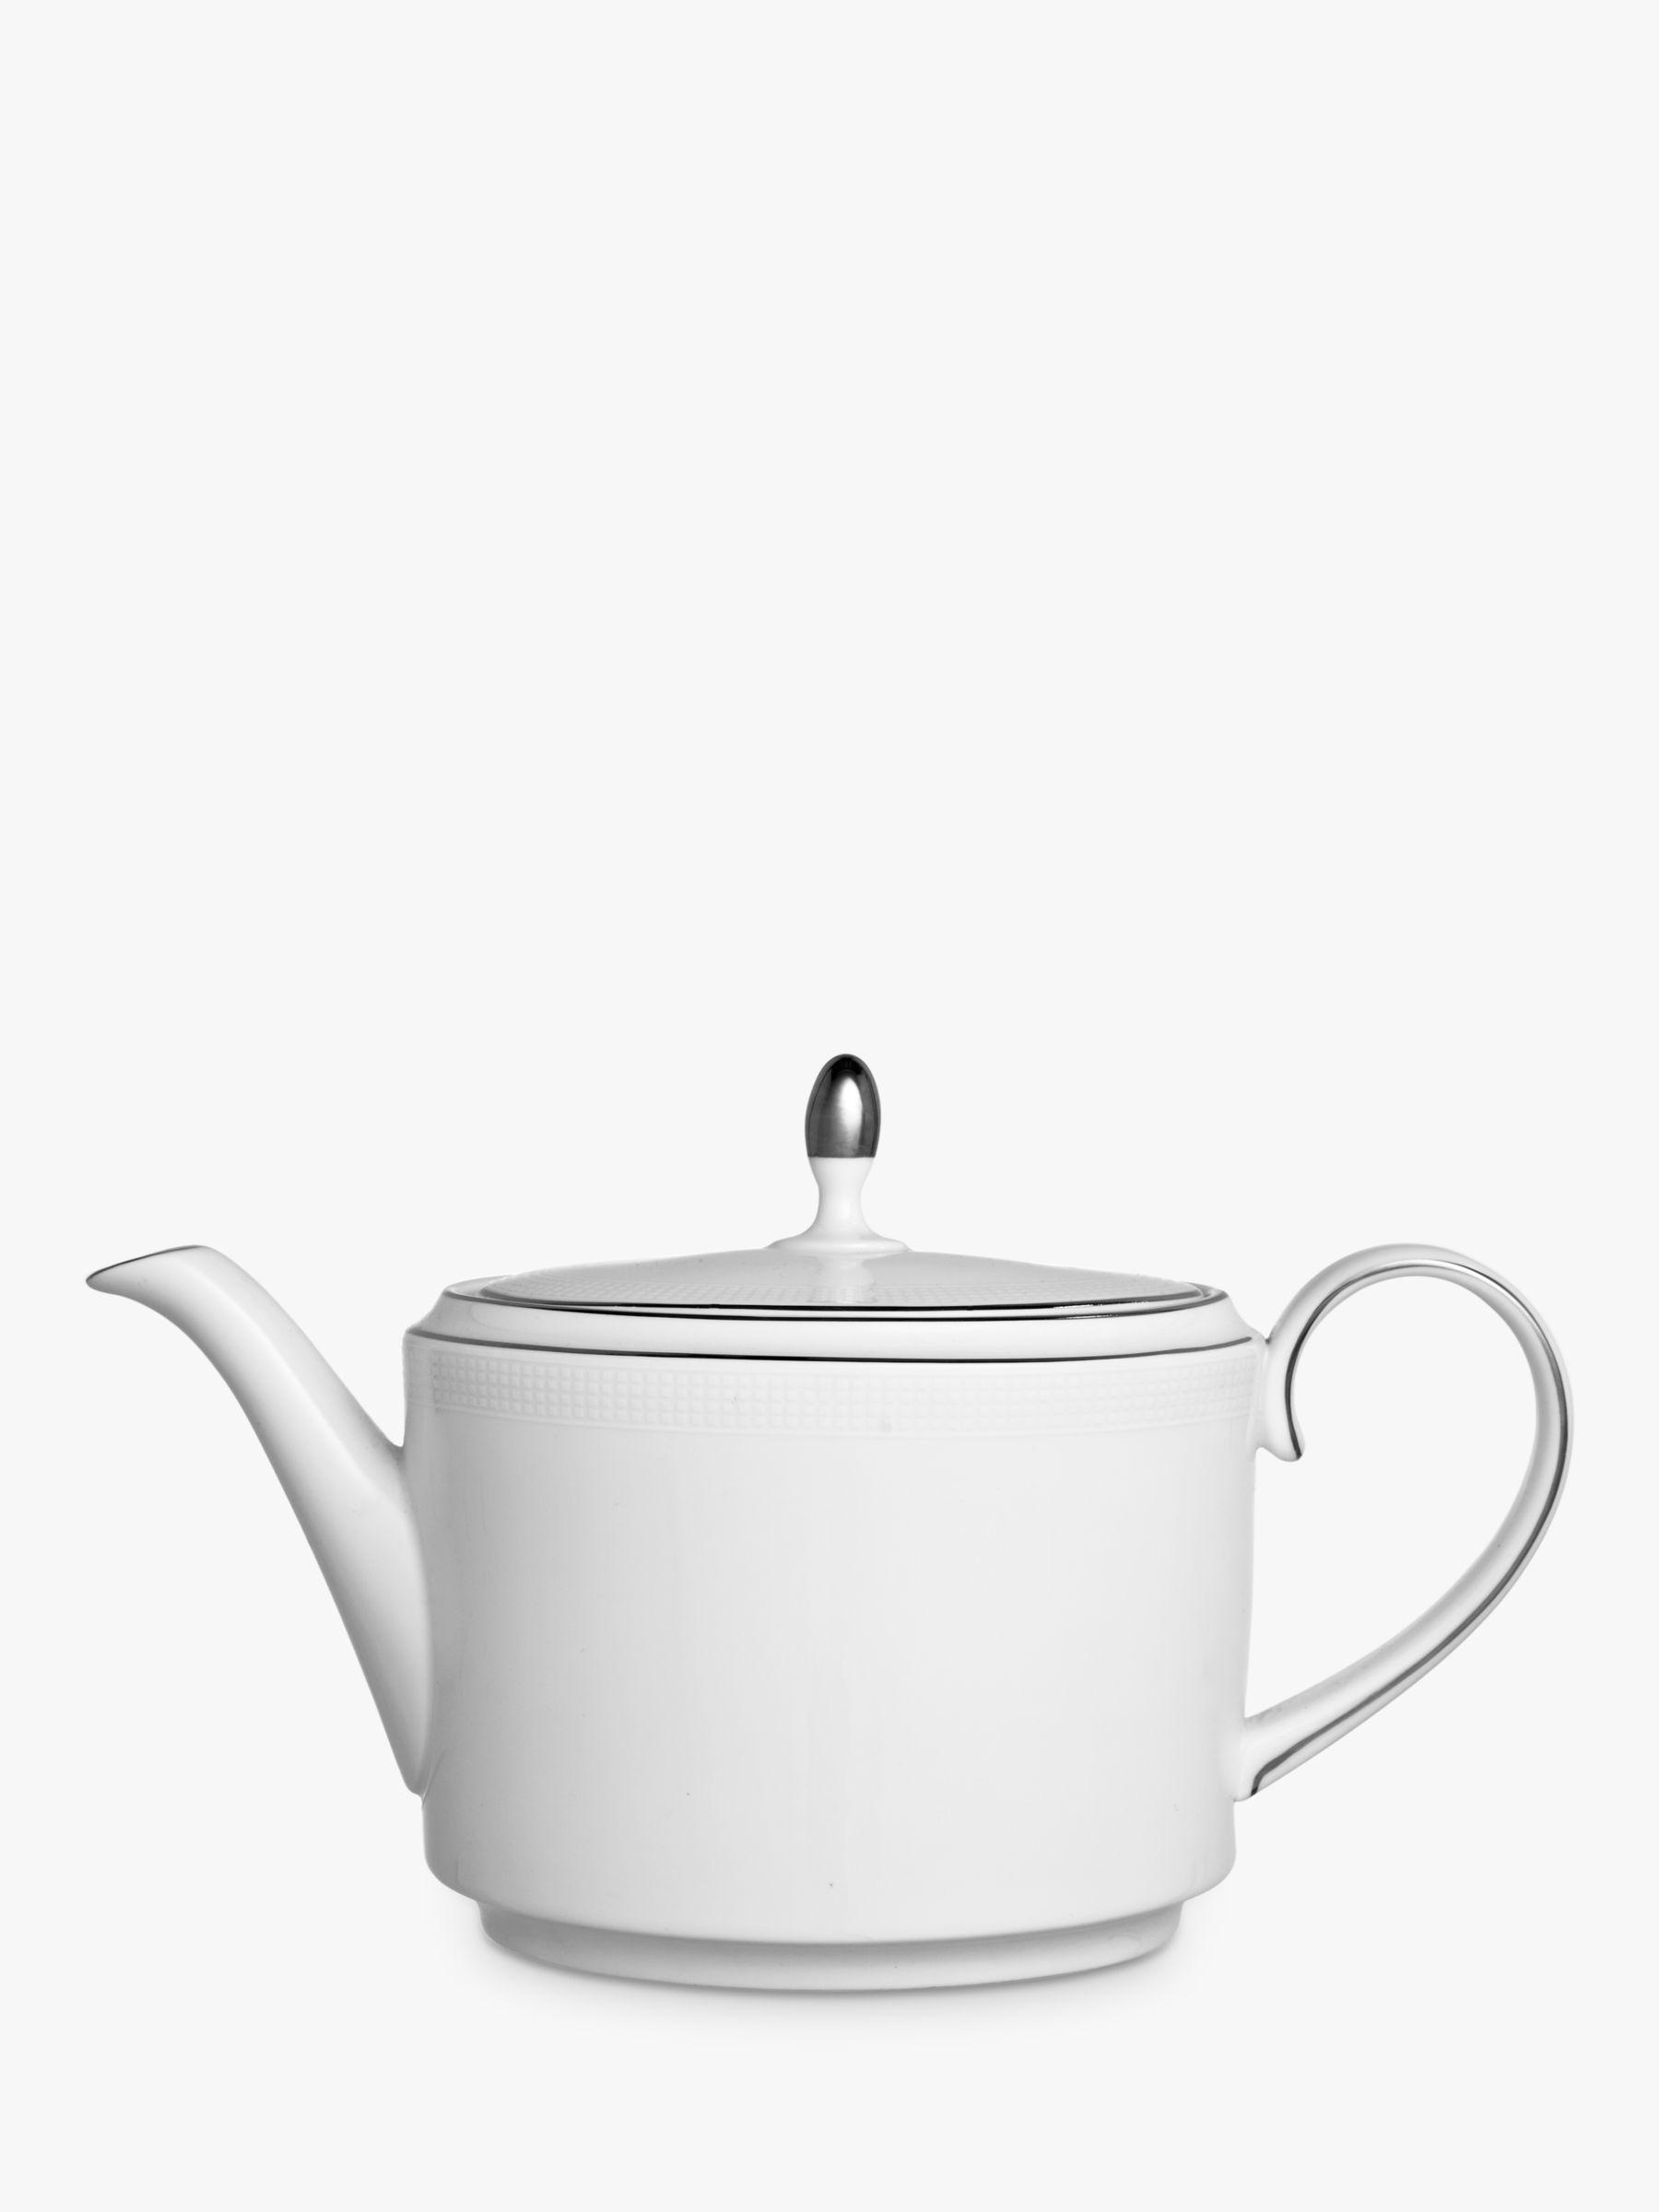 Vera Wang for Wedgwood Vera Wang for Wedgwood Blanc sur Blanc Teapot, 1.1L